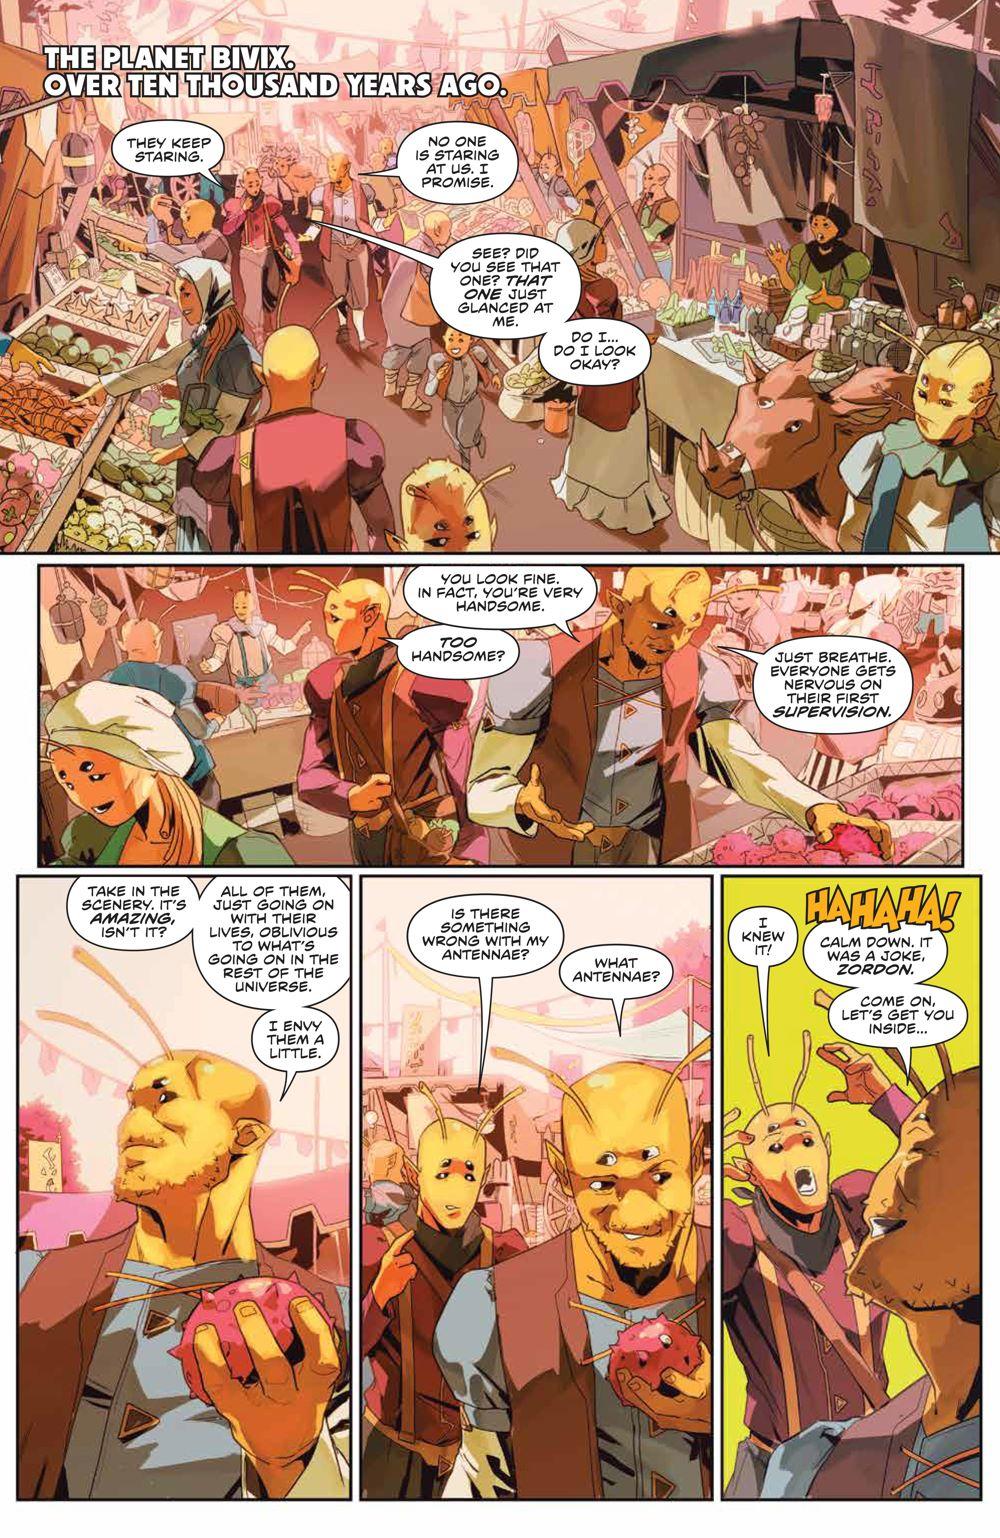 MightyMorphin_003_PRESS_3 ComicList Previews: MIGHTY MORPHIN #3